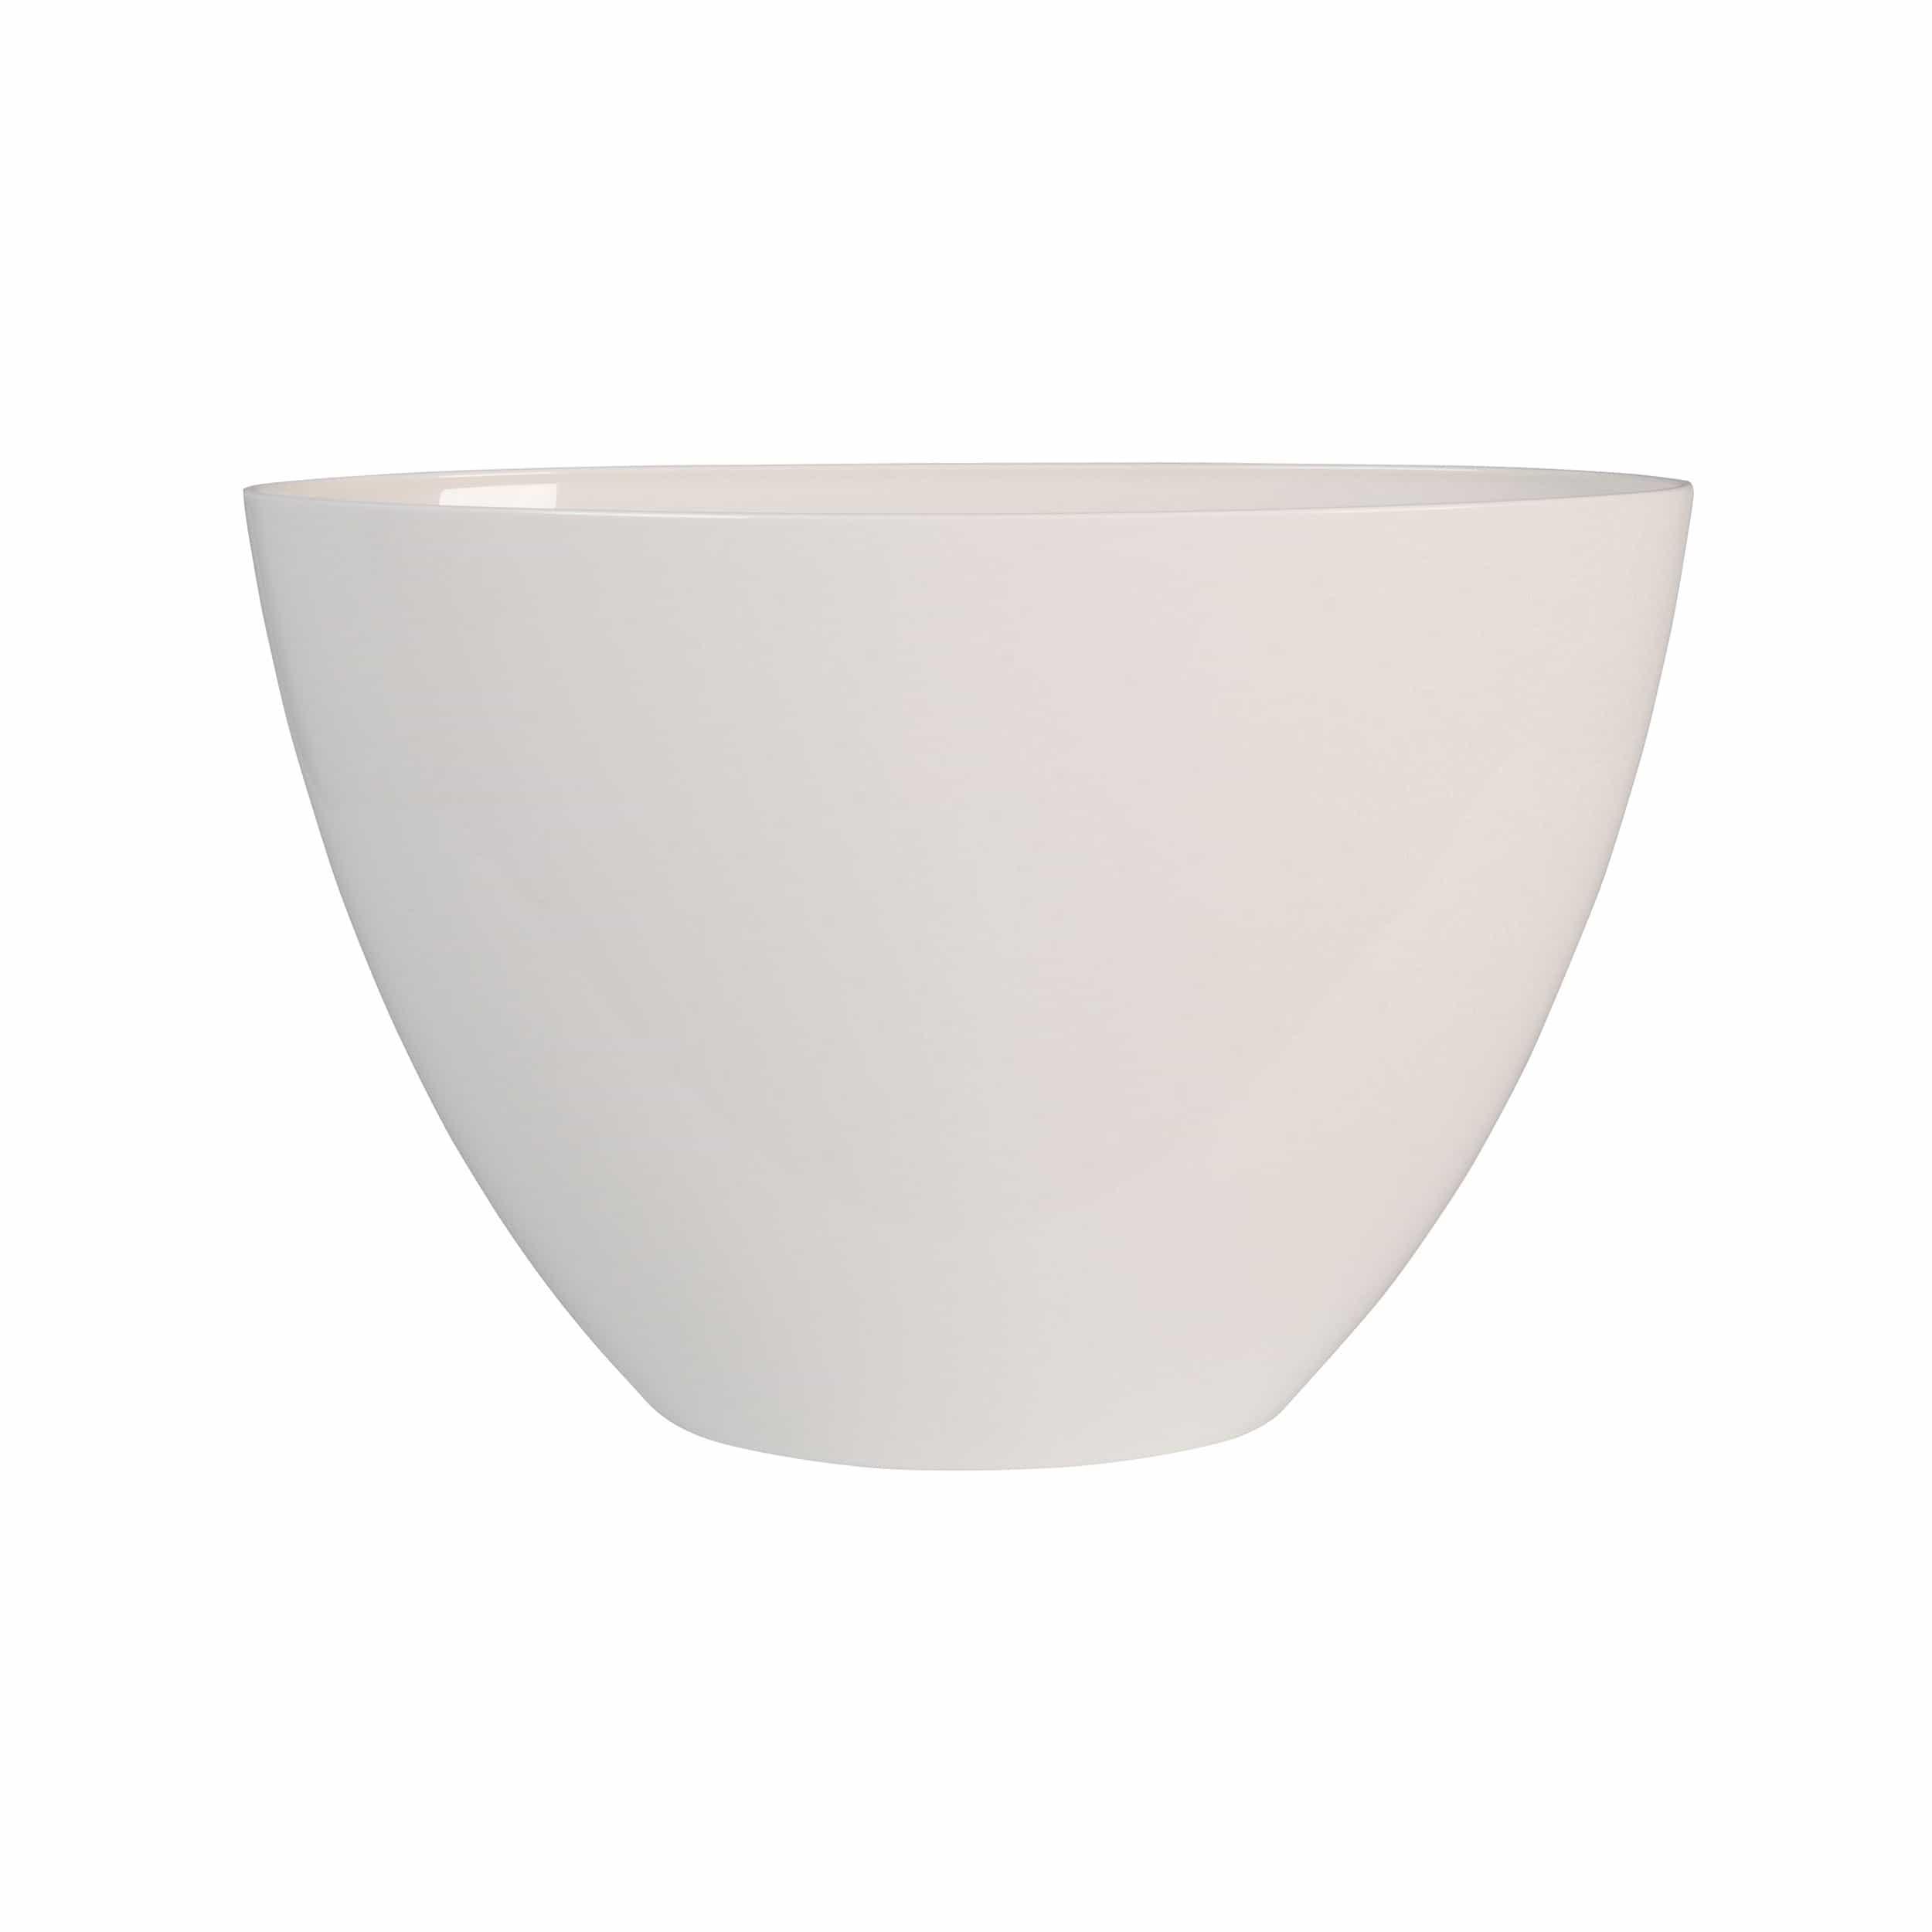 Pflanzgefäß Brussels Diamond Oval High L36cm weiß